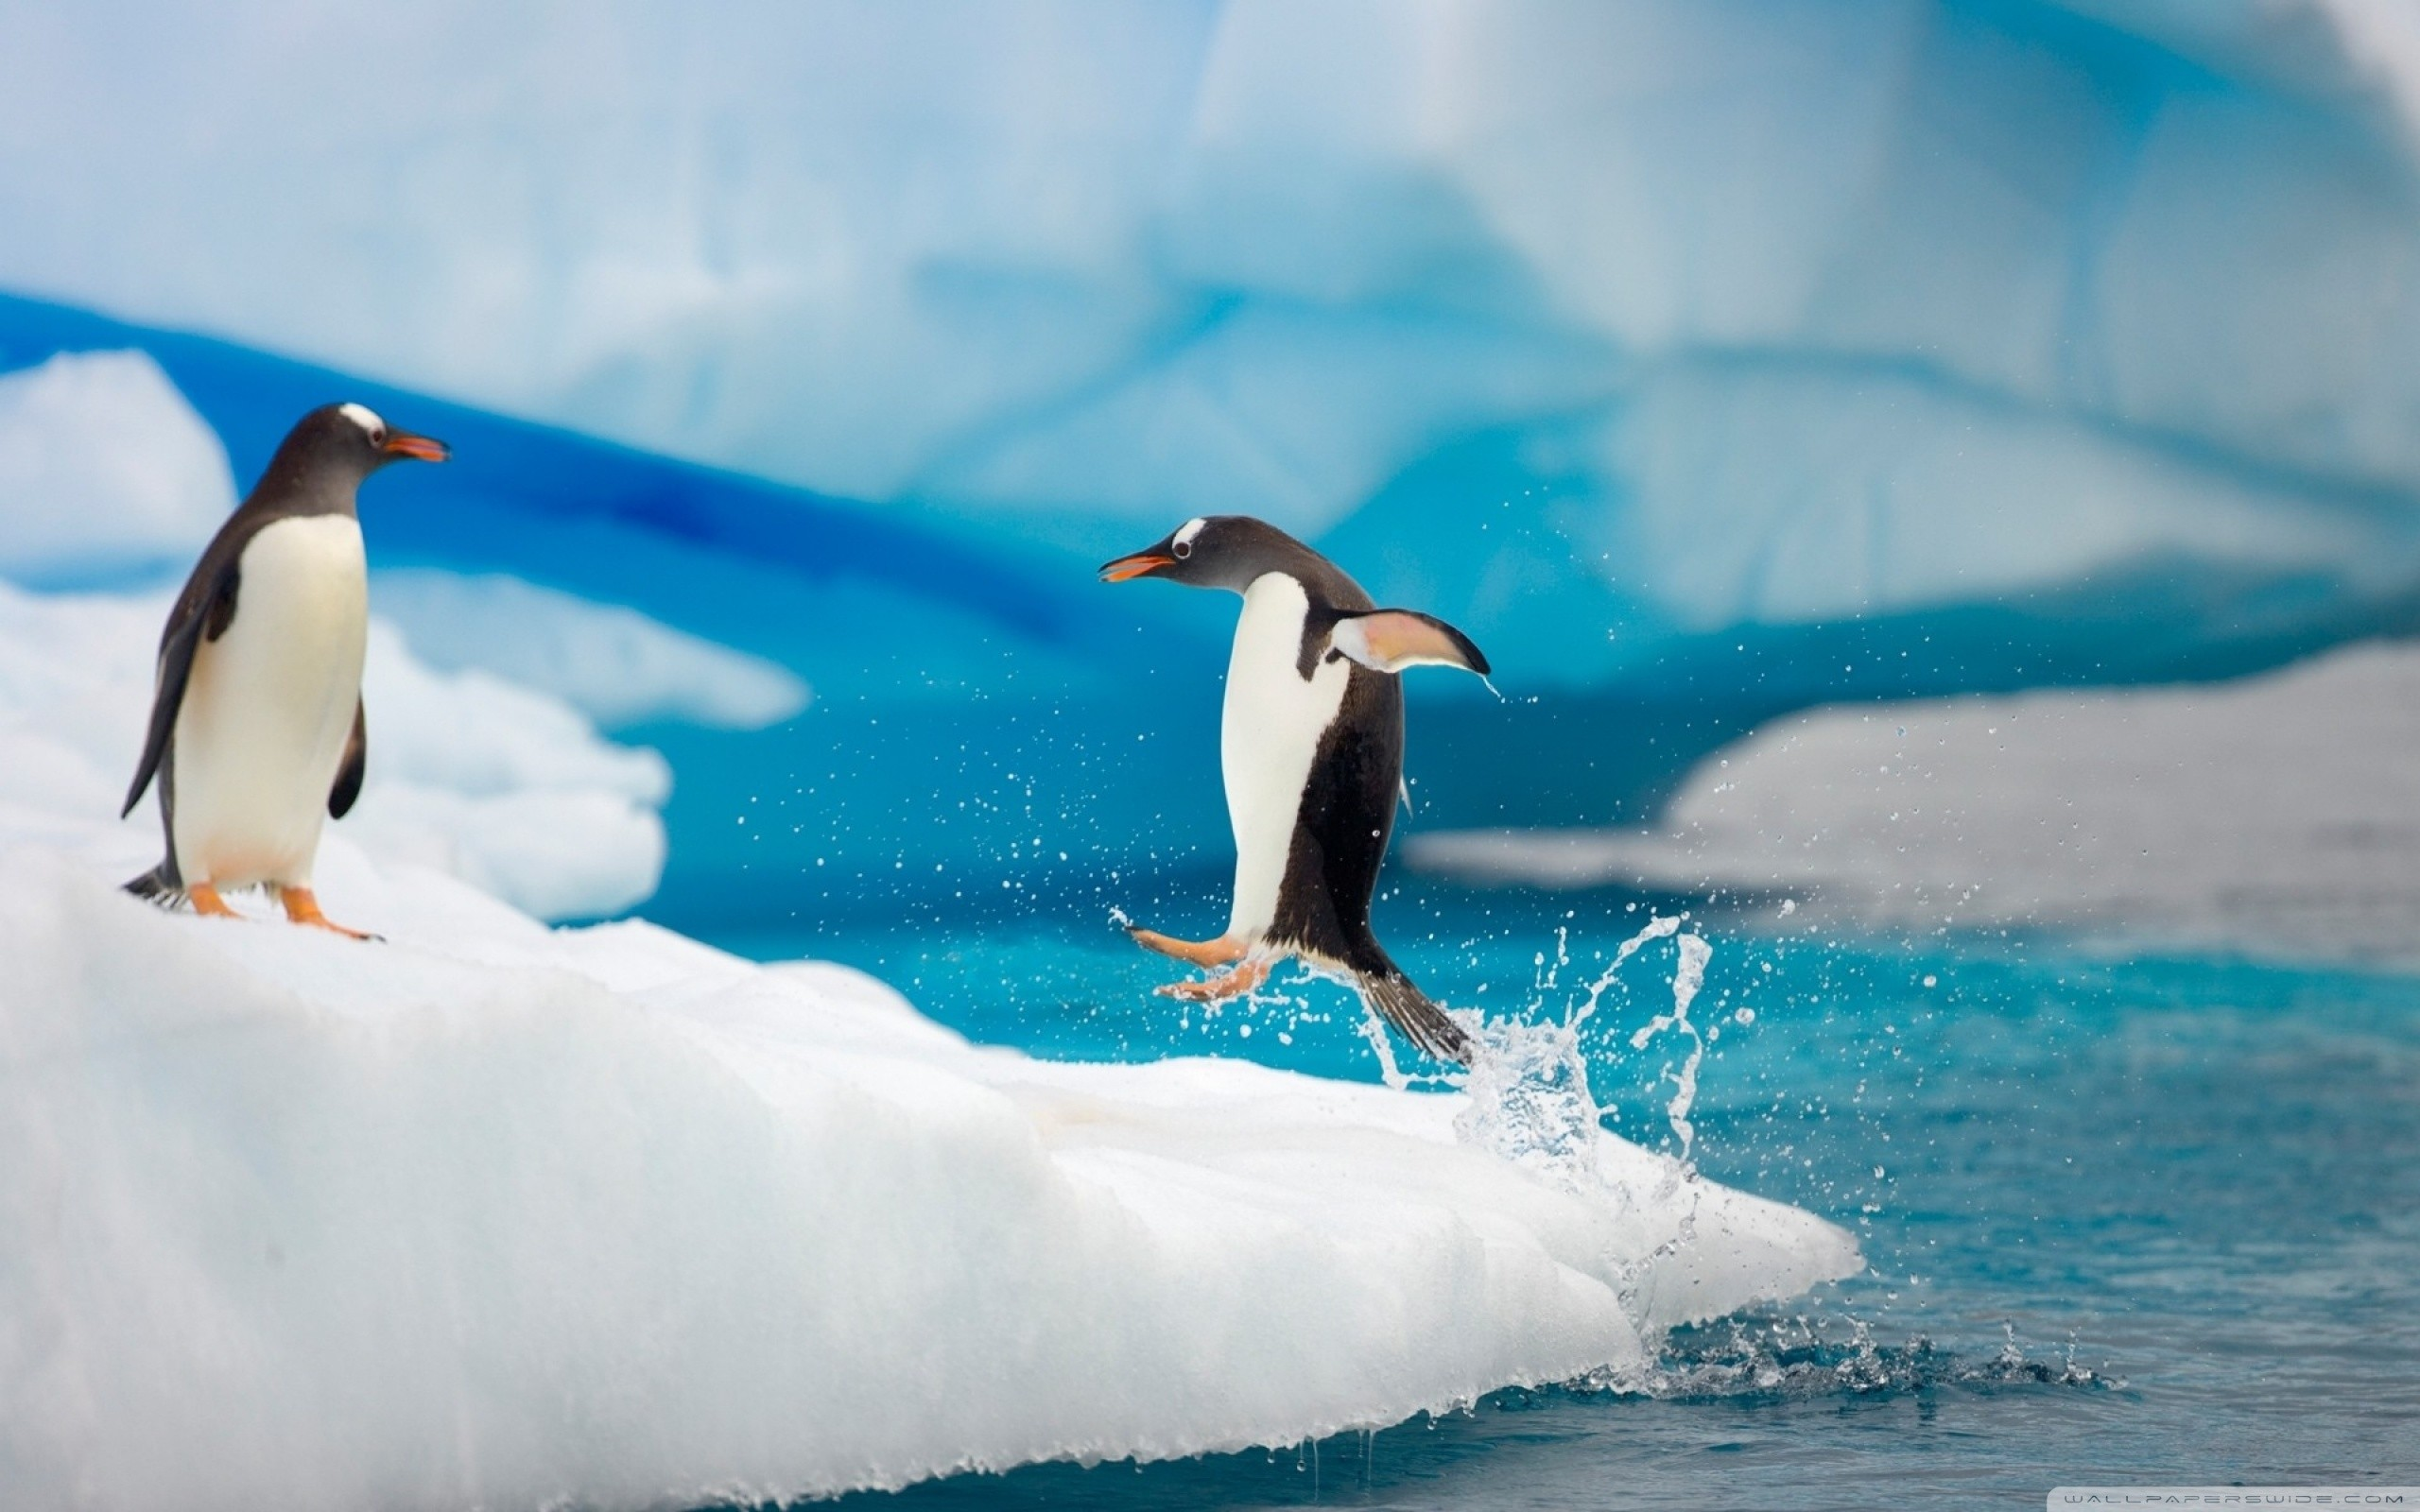 Penguin Jumping HD Wide Wallpaper for Widescreen